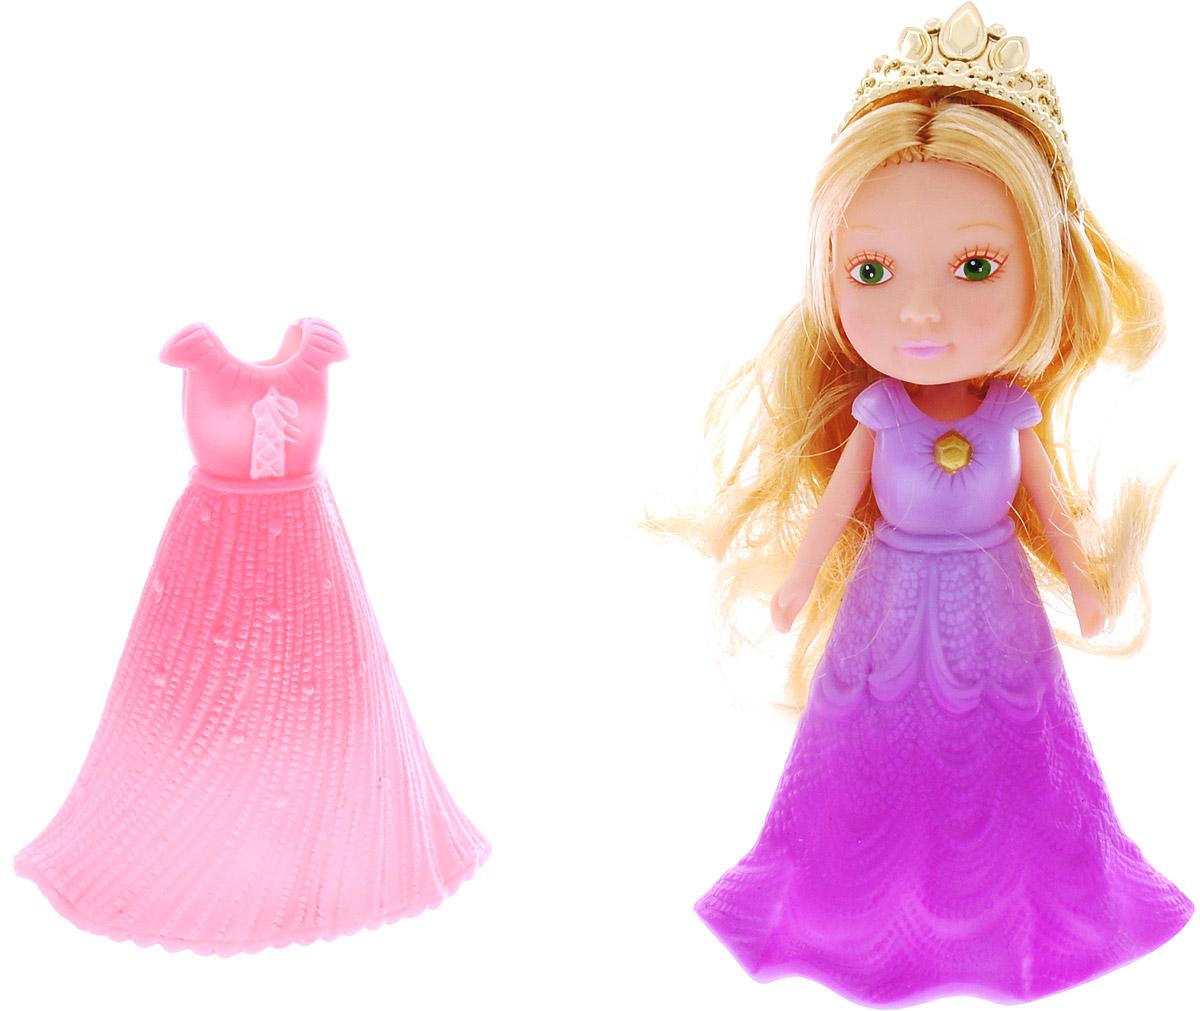 Veld-Co Мини-кукла Принцесса цвет сиреневый розовый